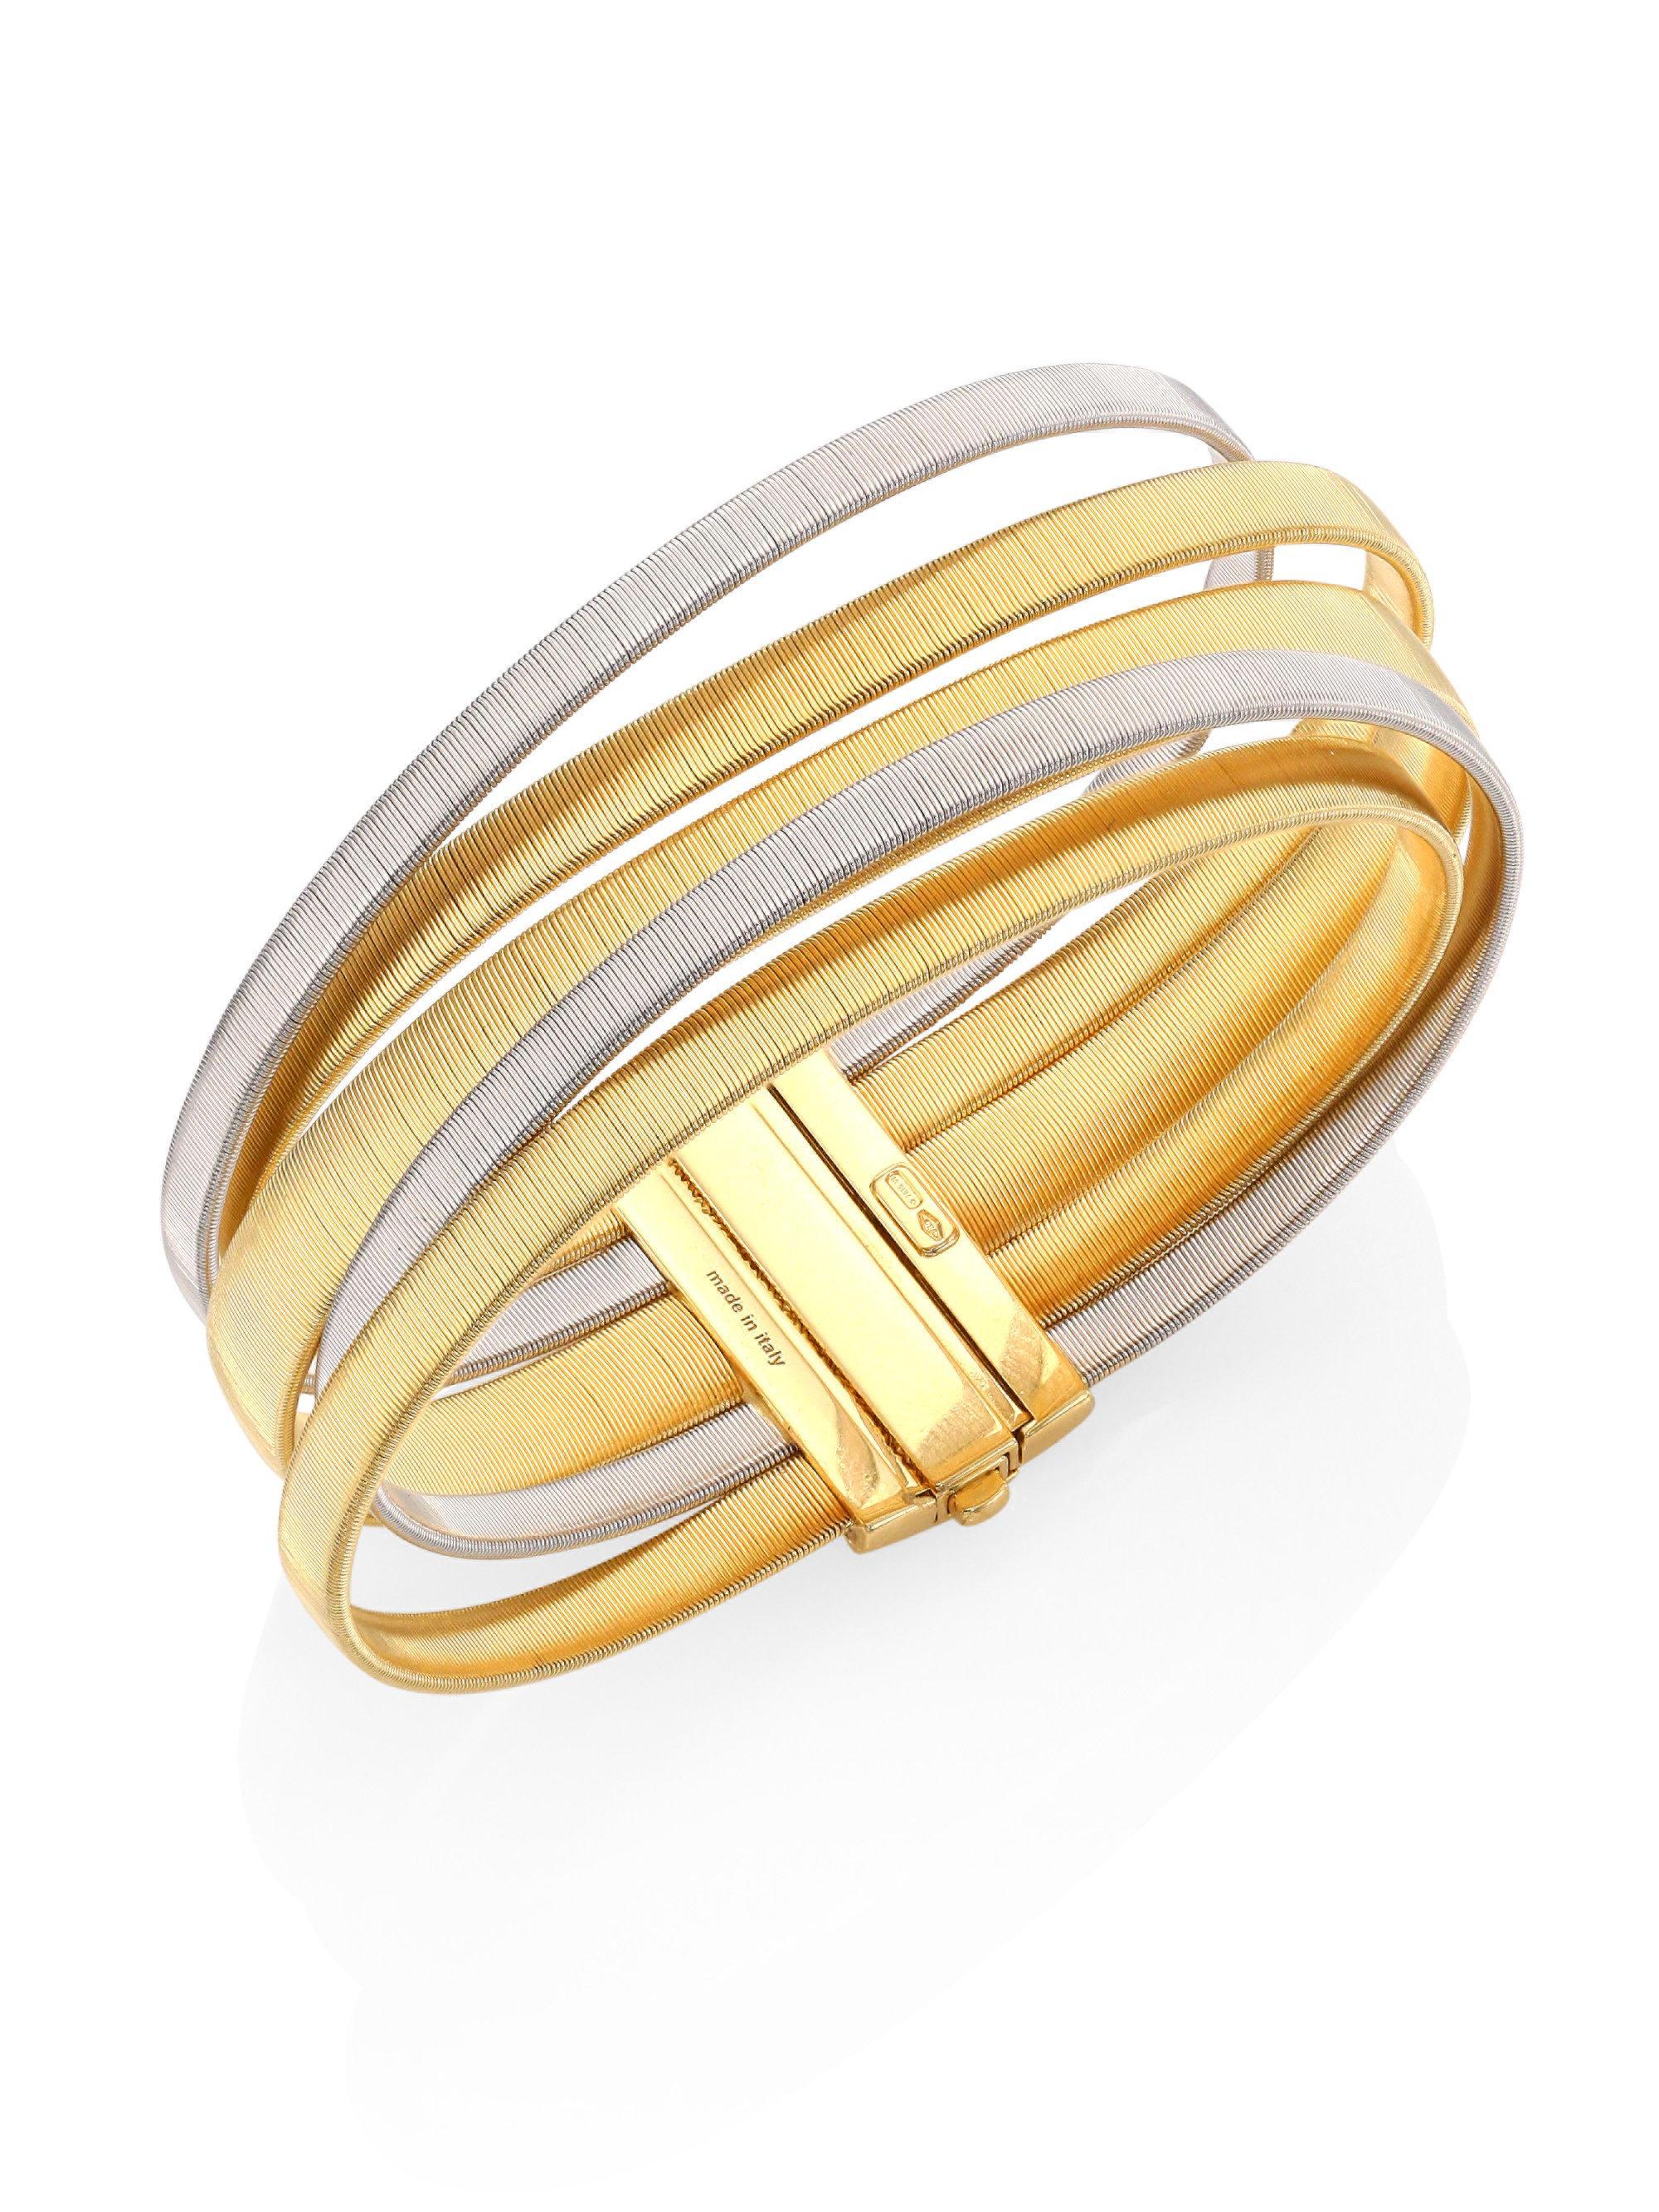 Marco Bicego Masai 18K White Gold Five-Strand Bracelet with Diamond Stations pbKXmyHCVy